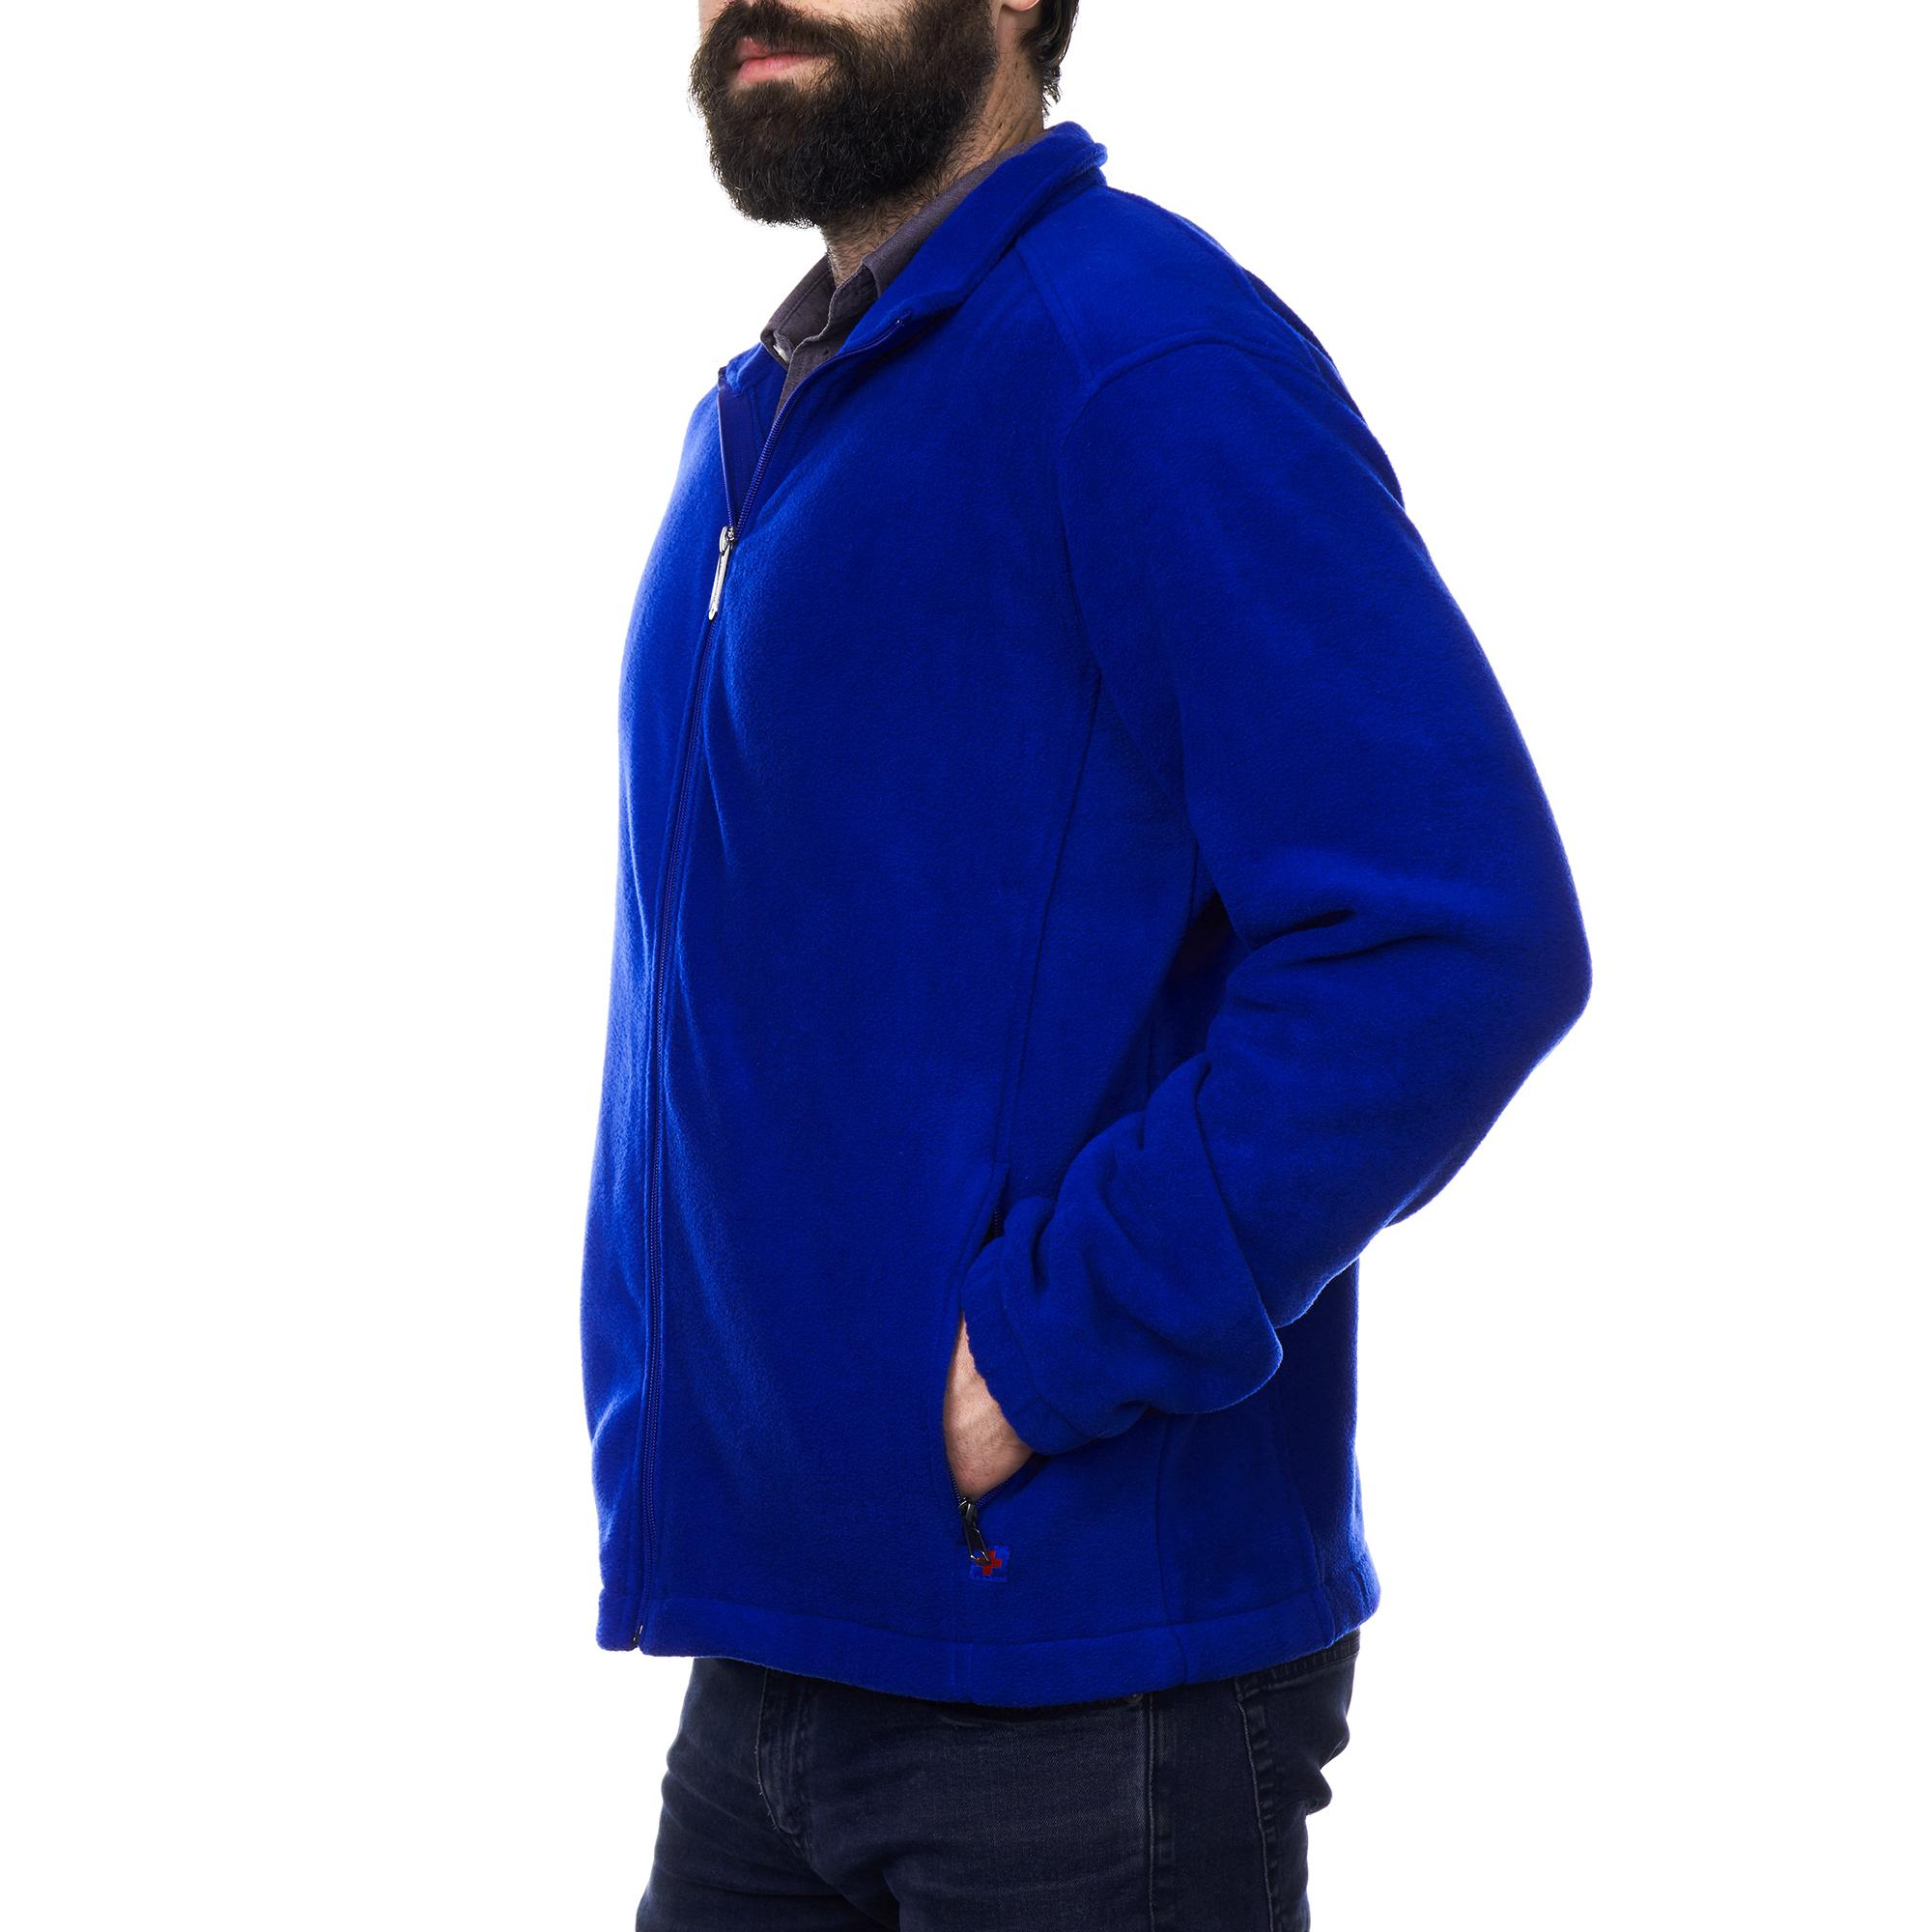 Alpine-Swiss-Trent-Mens-Full-Zip-Up-Fleece-Jacket-Soft-Casual-Warm-Zipper-Coat thumbnail 21